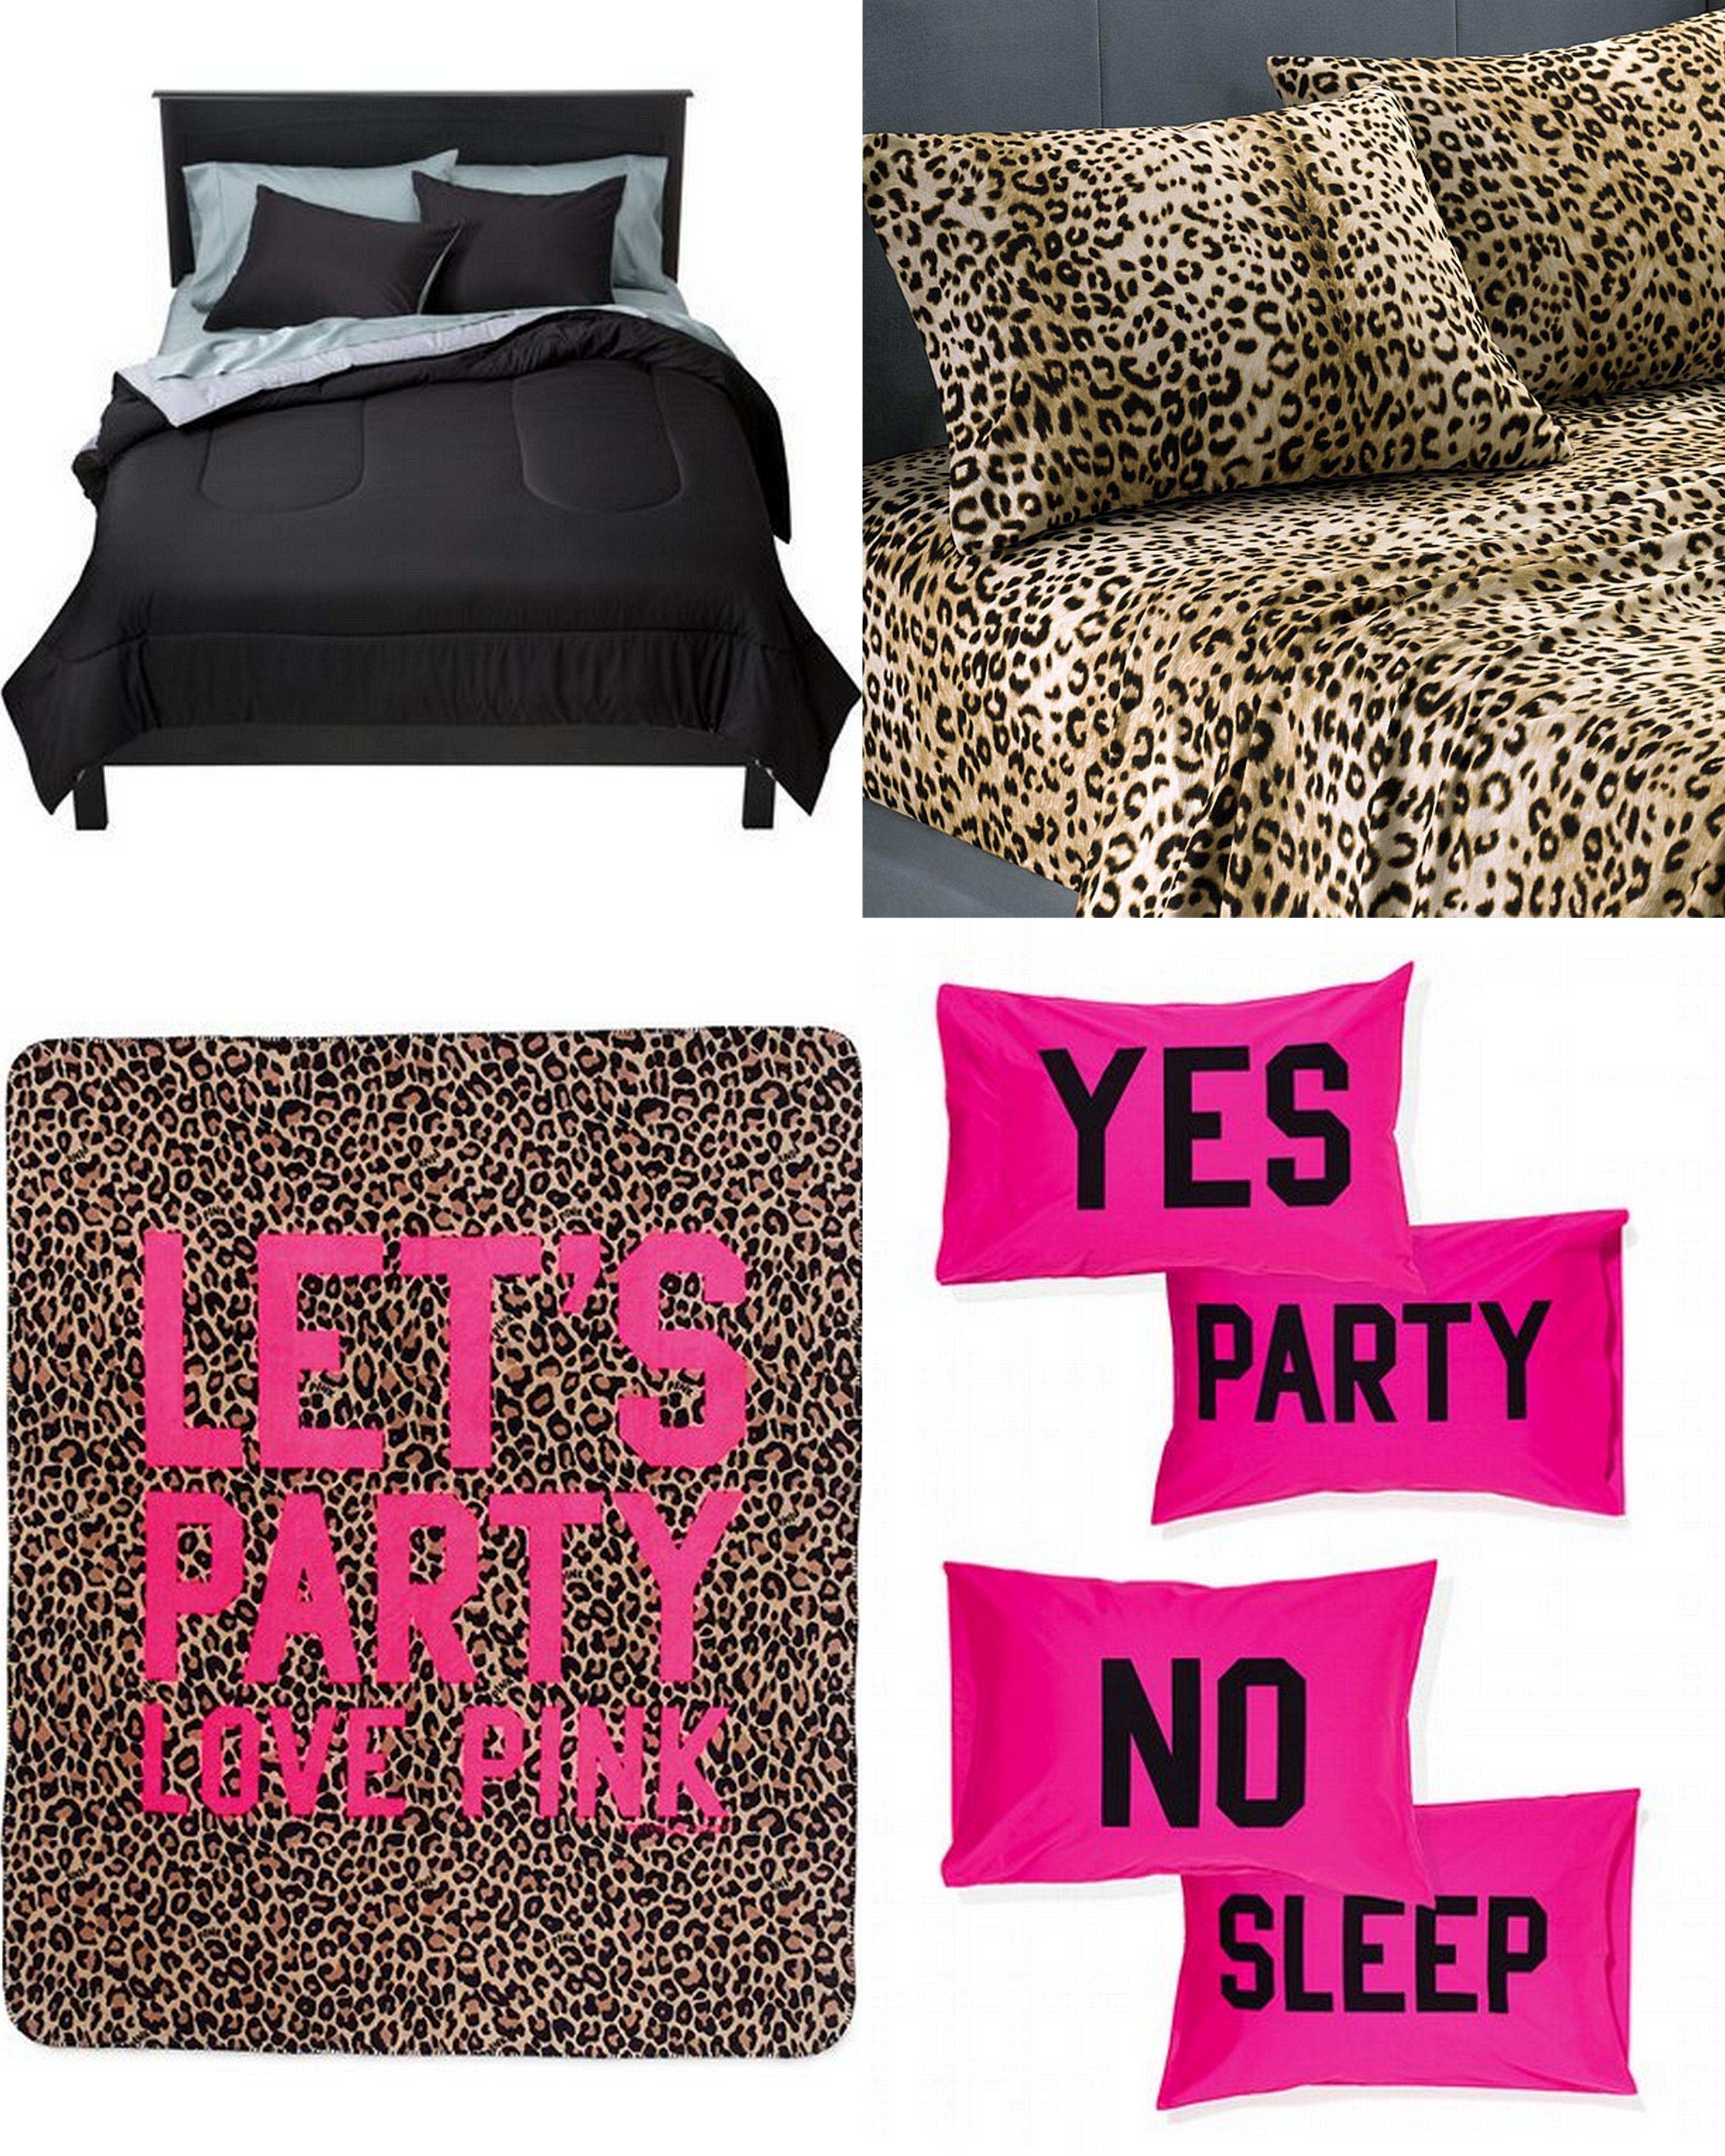 My bed set target plain black comforter overstock com cheetah sheets pillowcases vs pink